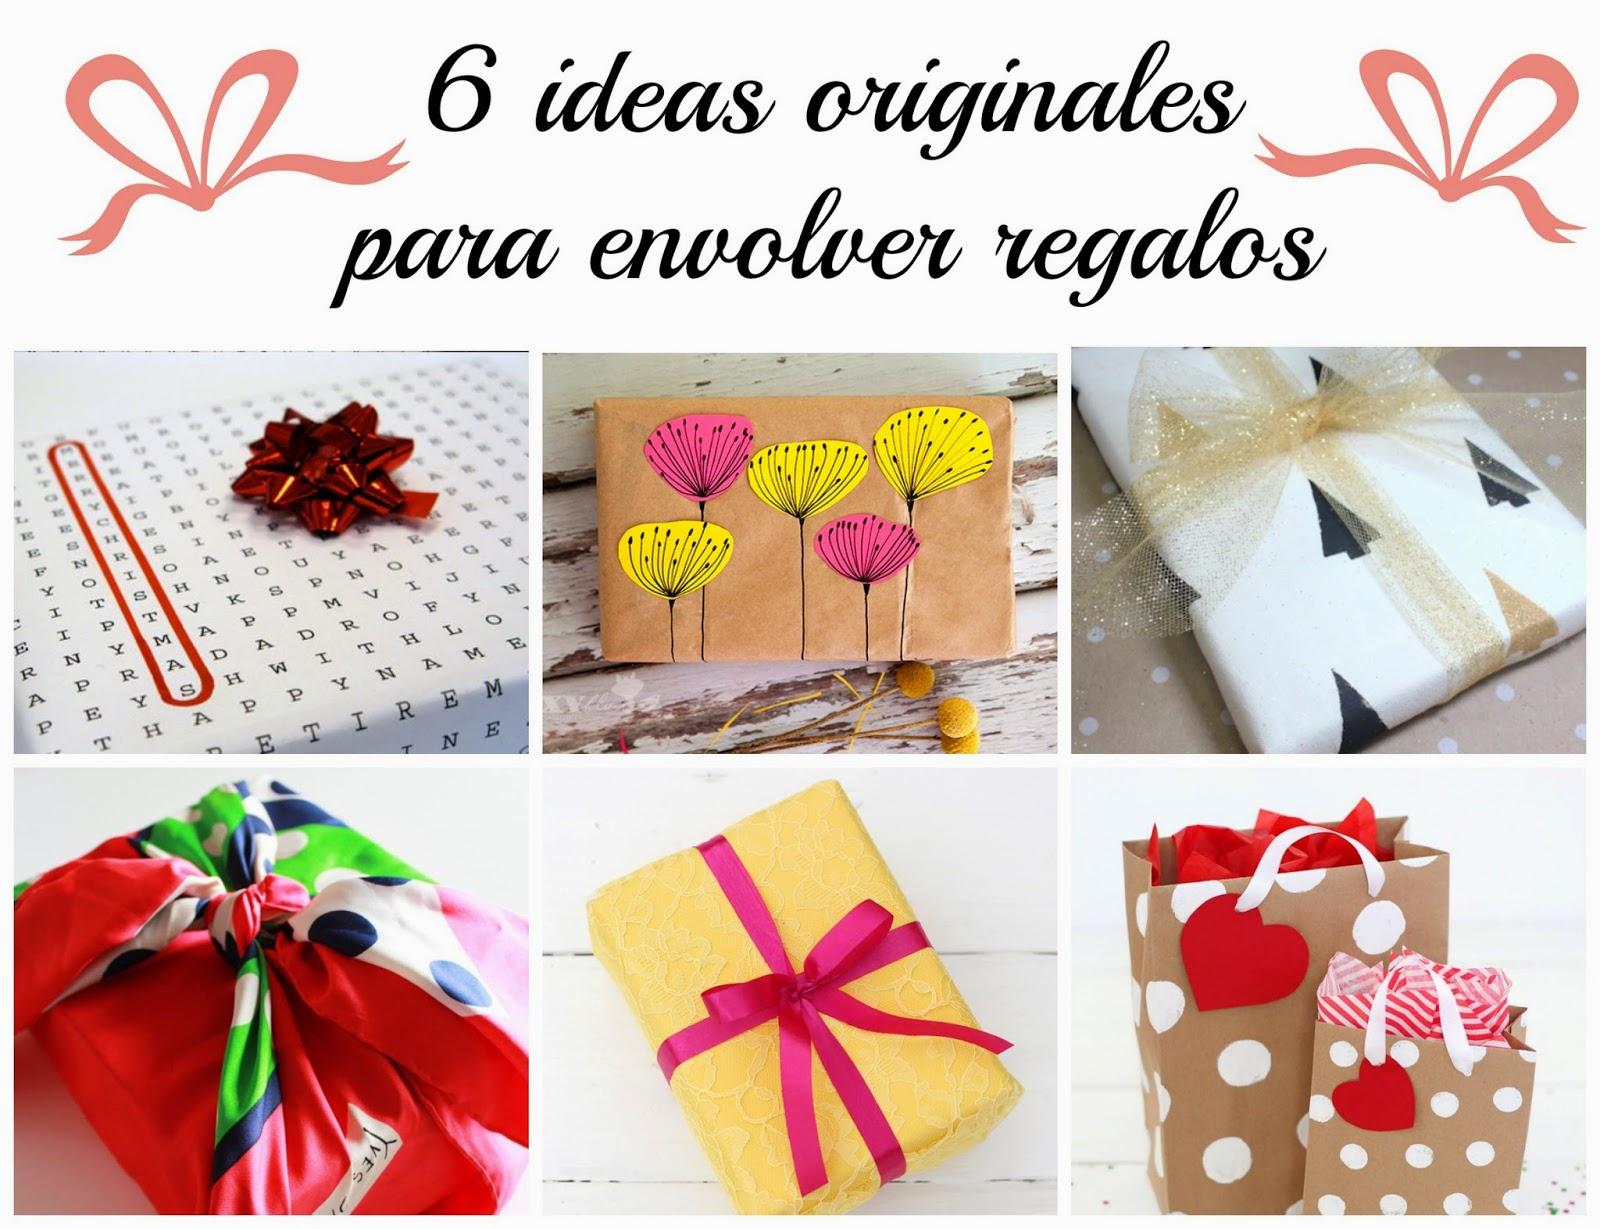 dyi regalos detalles navidad envoltorios caseros estampados lazos wrap wrapping papel cmo envolver